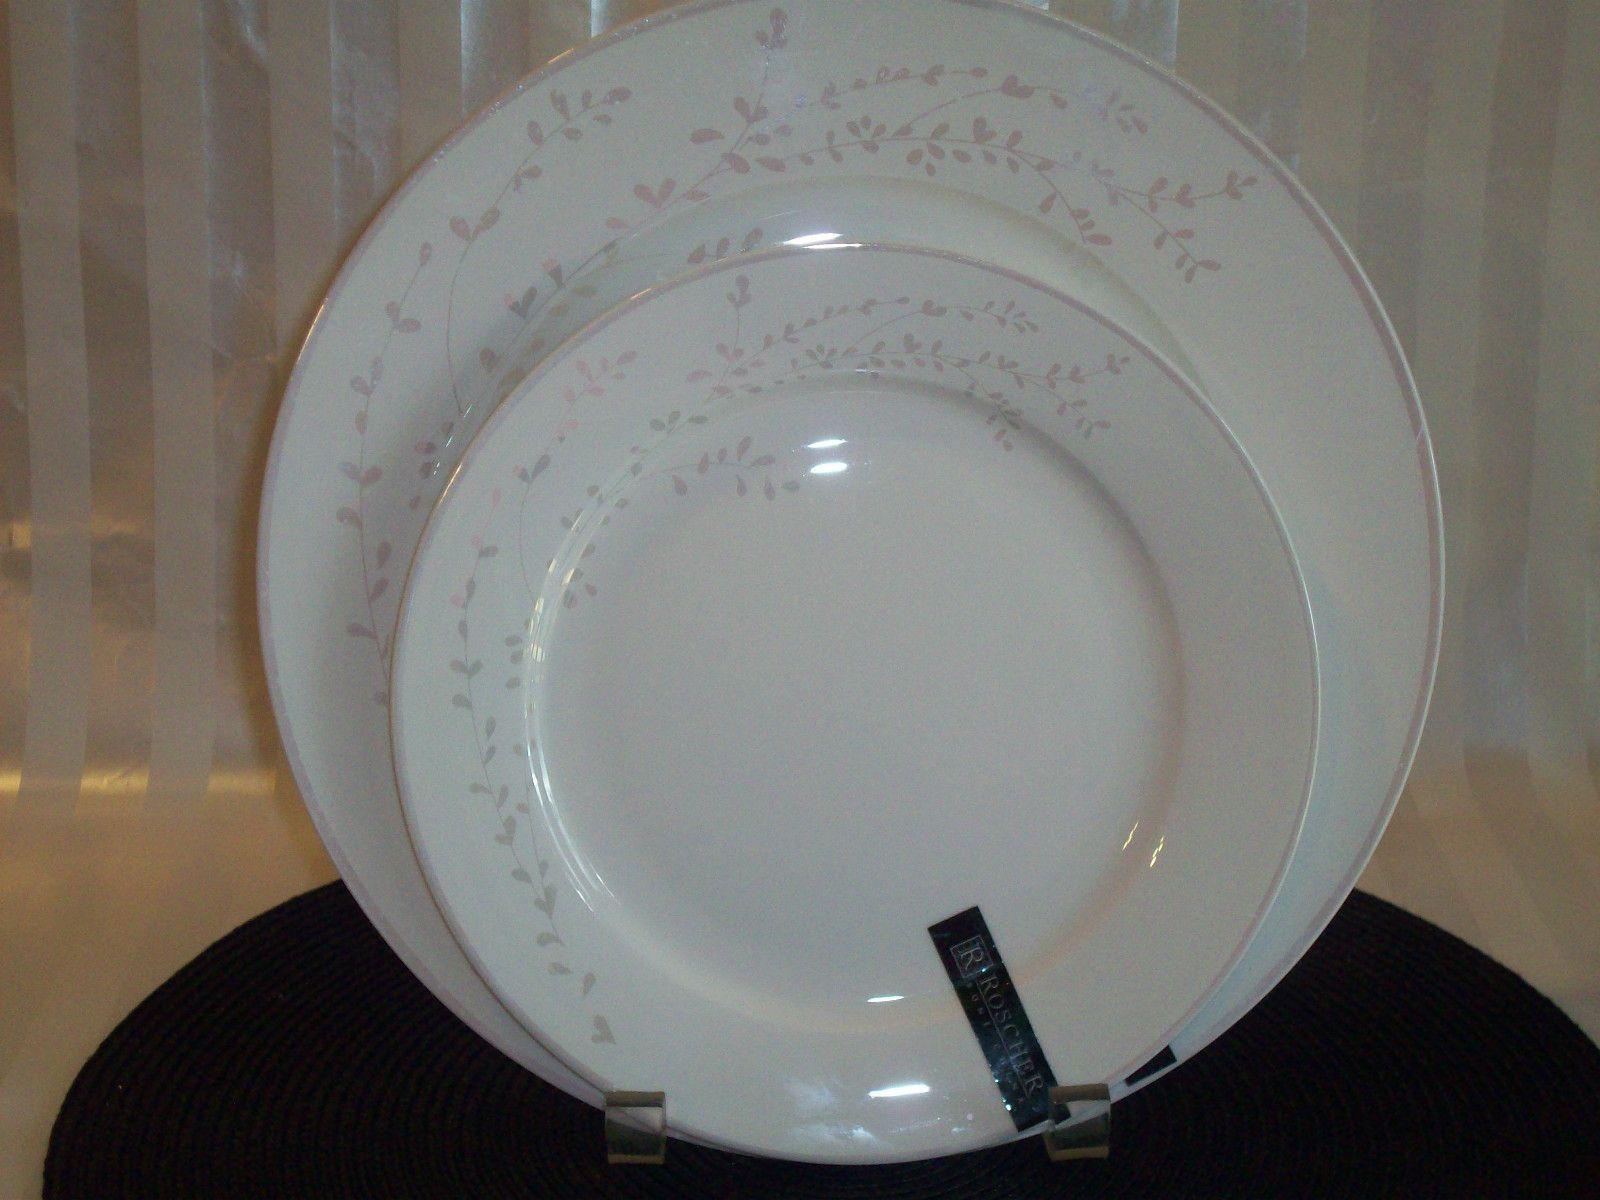 8 PC Roscher Bone China White Pearl Leaves 4 Dinner 4 Salad Plates New | eBay & 8 pc ROSCHER BONE CHINA White Pearl Leaves 4 Dinner + 4 Salad ...